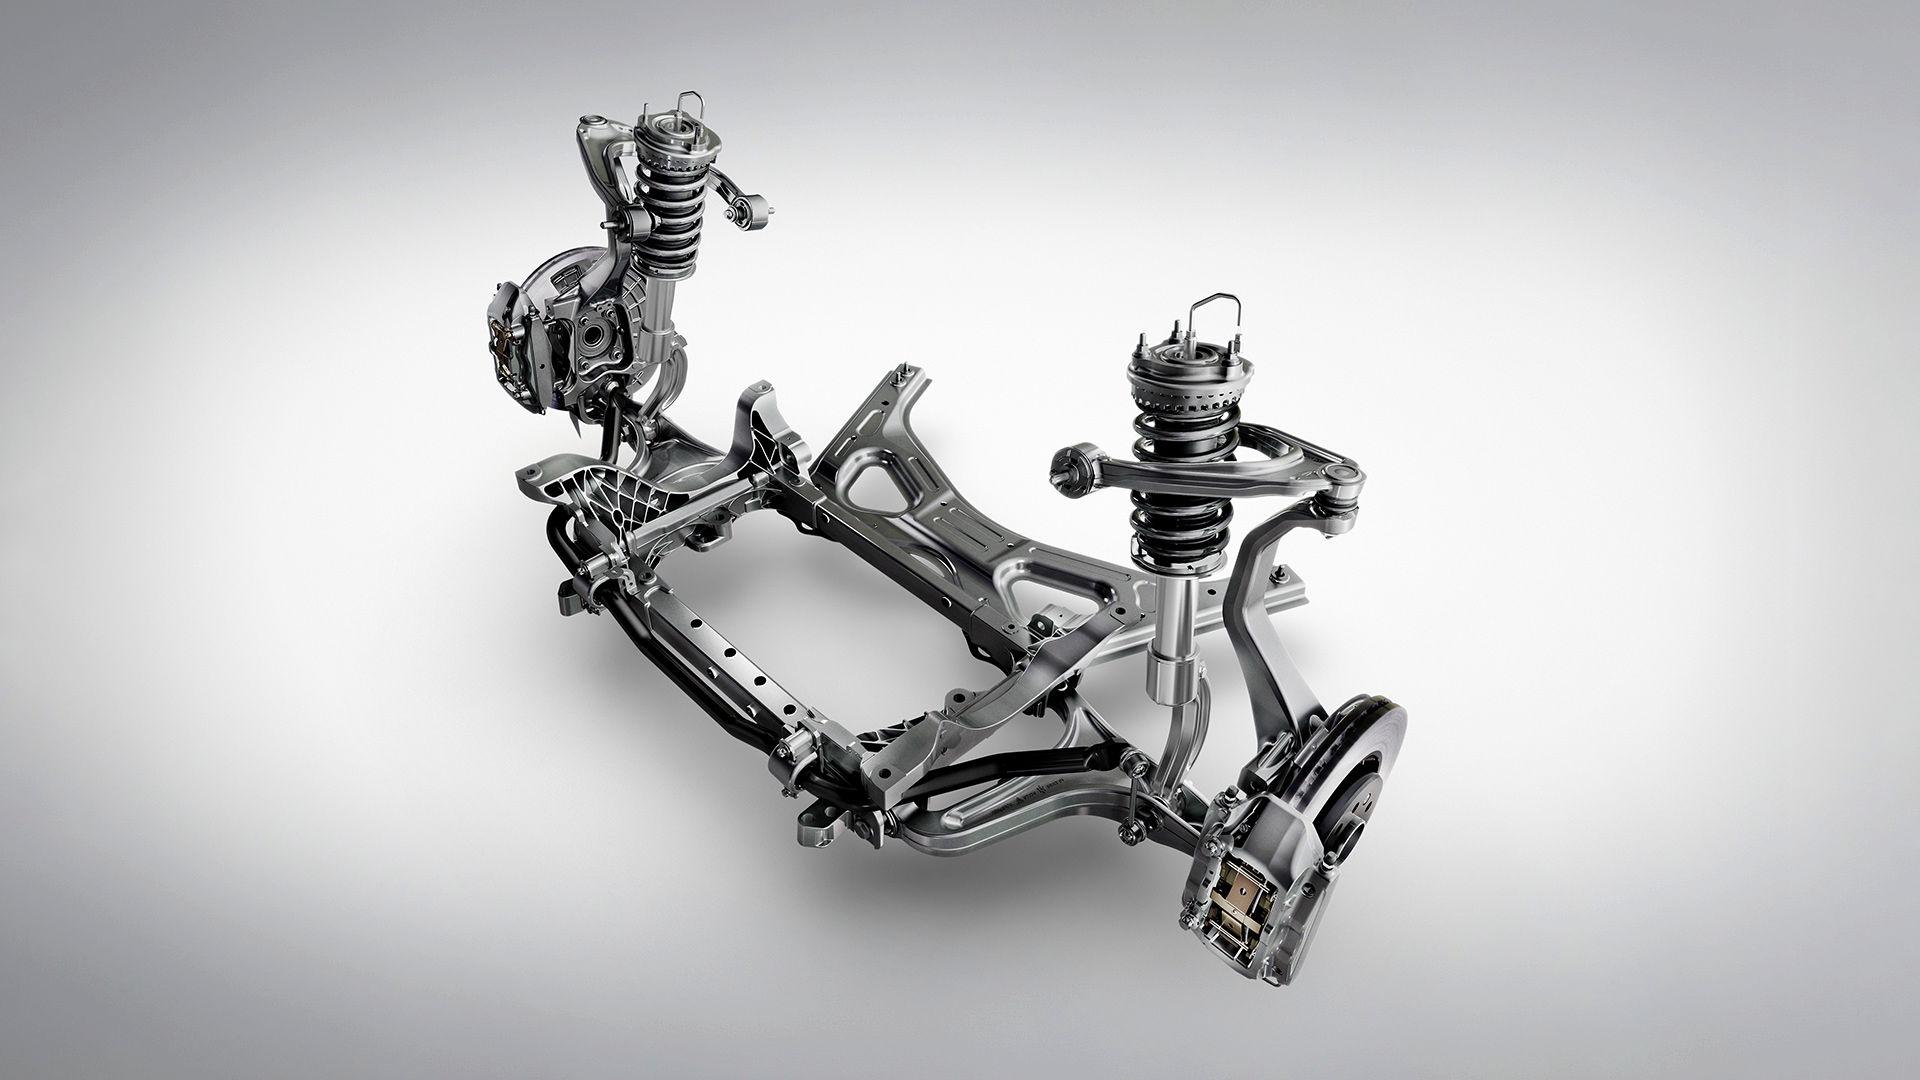 Maserati Levante Trofeo - Syhook Fahrwerk